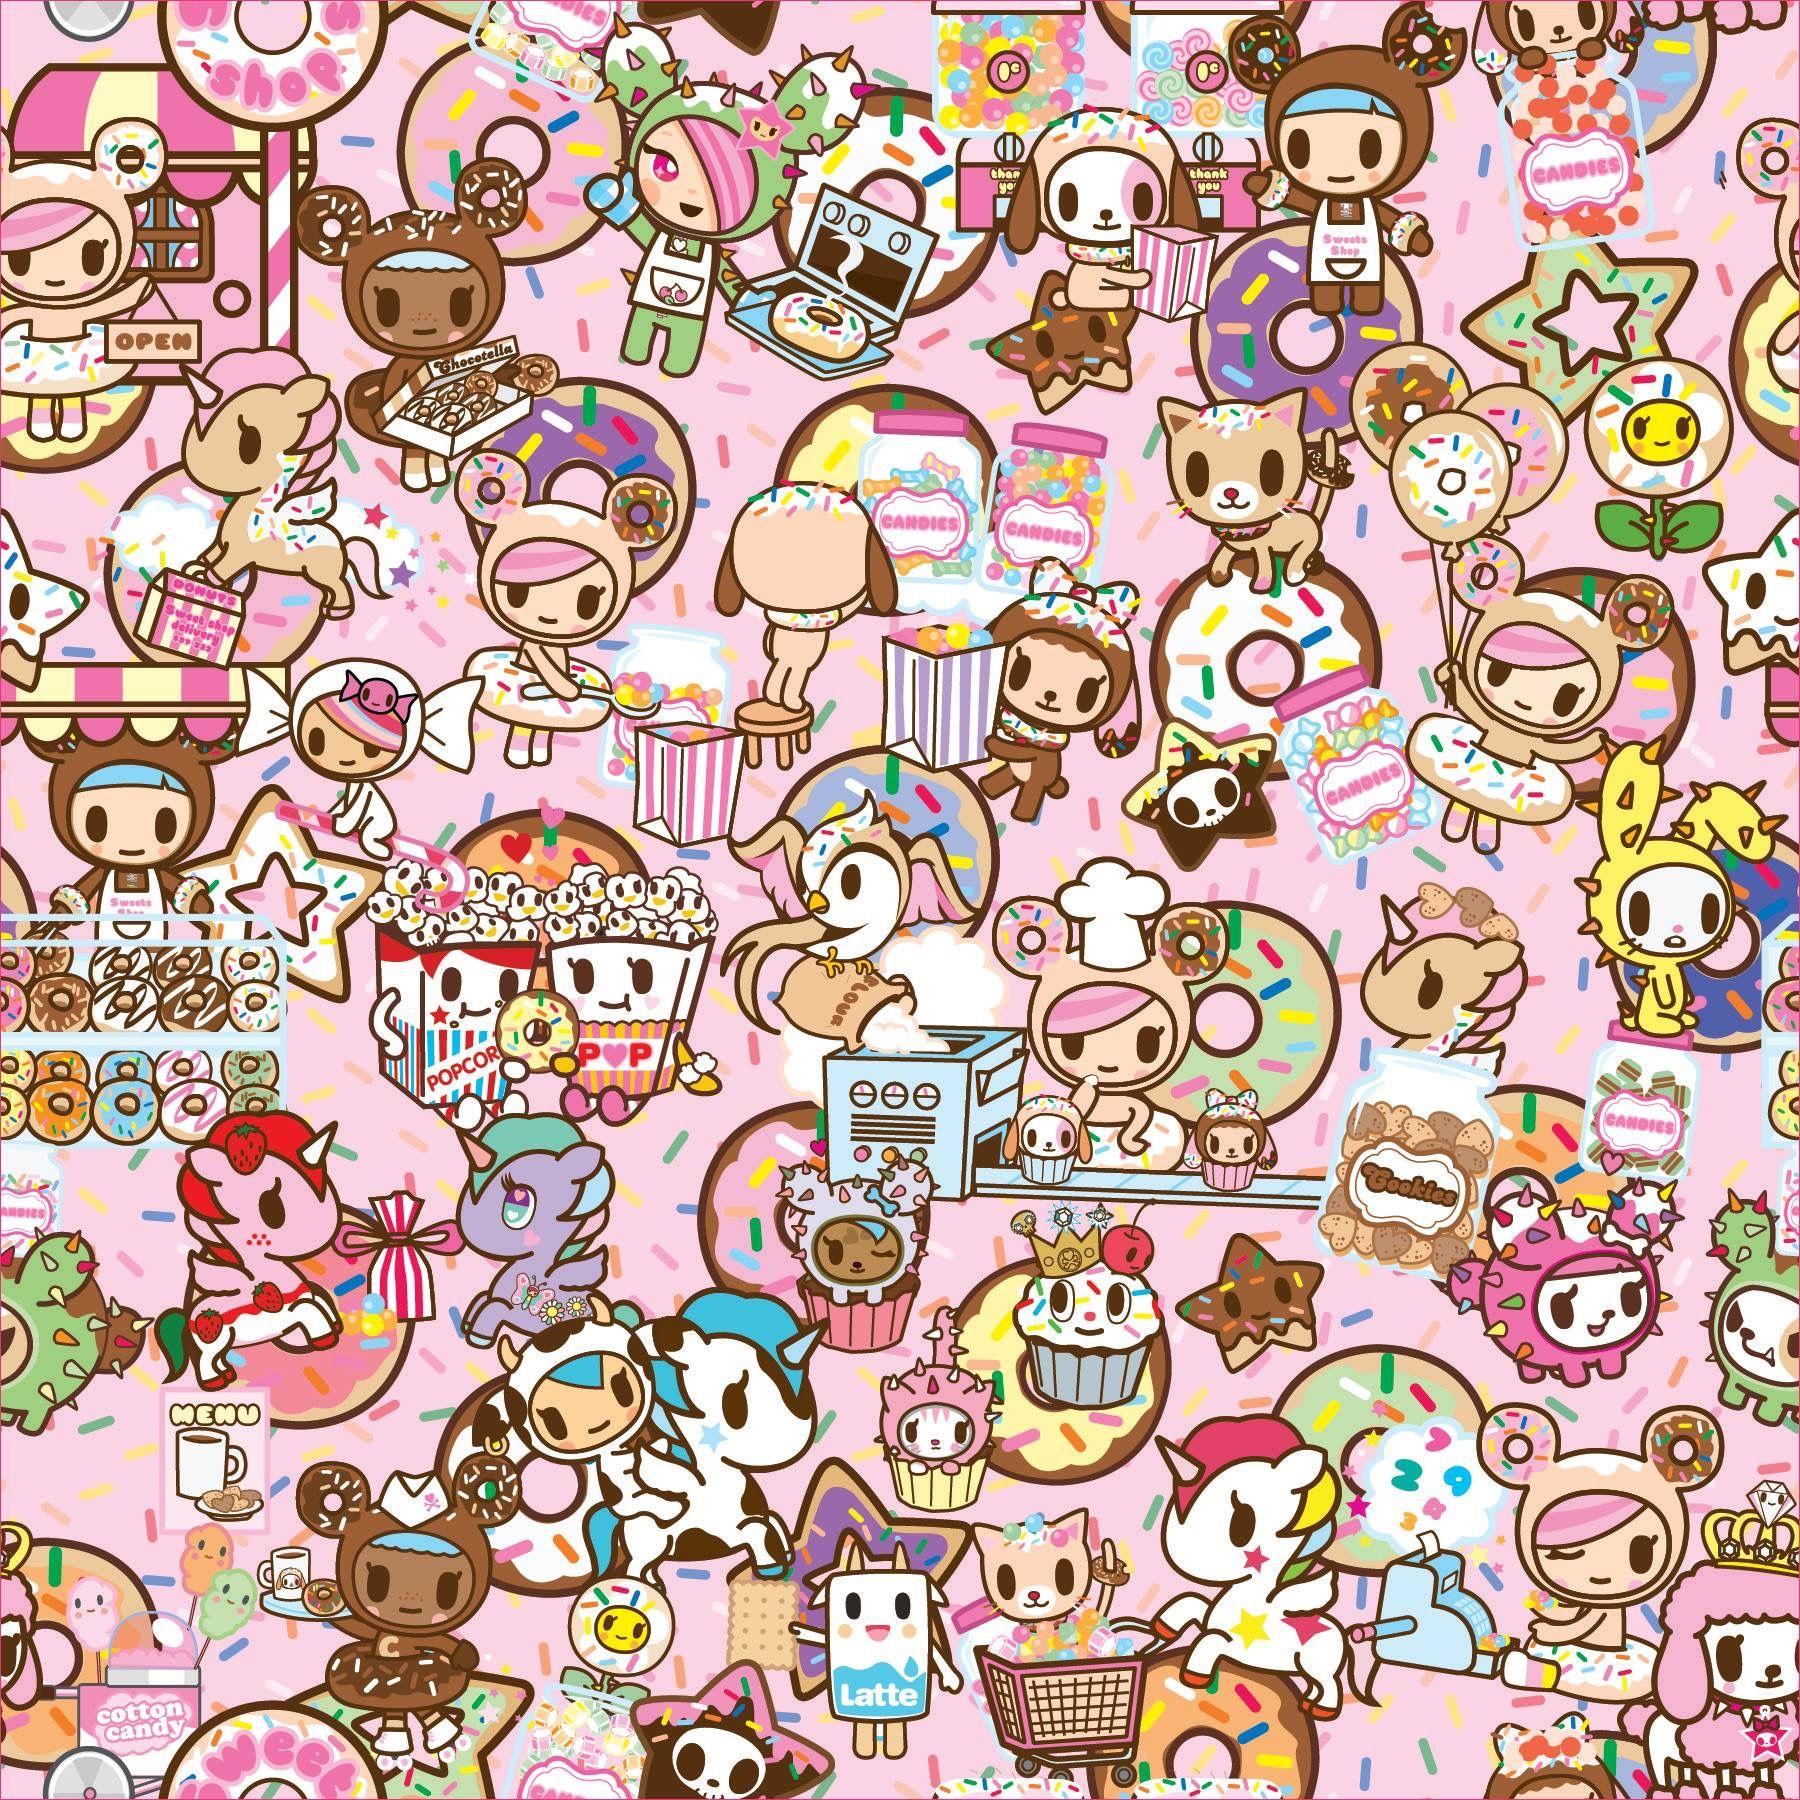 Awesome Cute Binder Wallpapers That Are Printable Image Result For Tokidoki Moofia Kawaii Kawaii